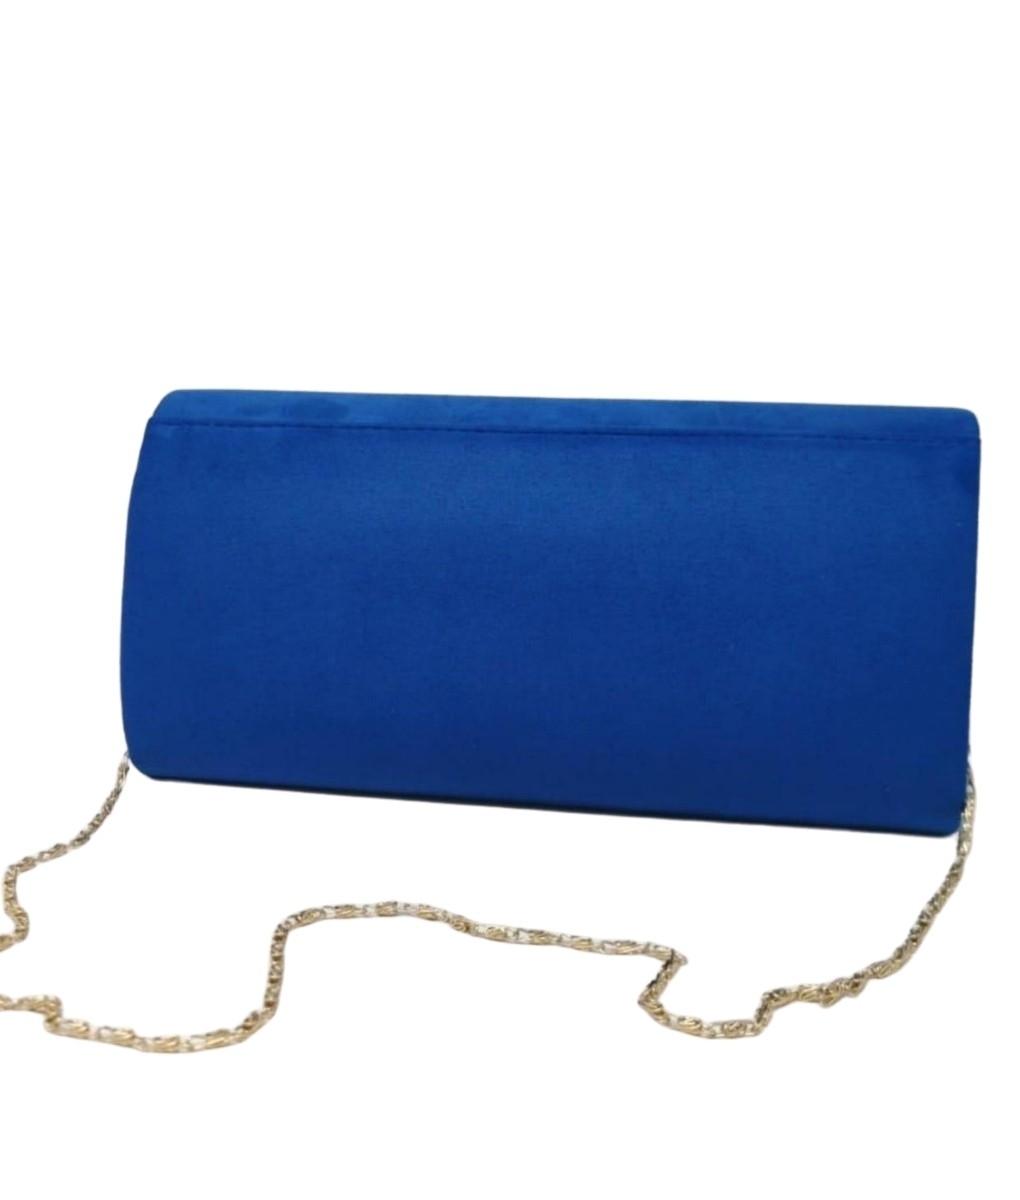 IDAIRA HANDBAG - BLUE